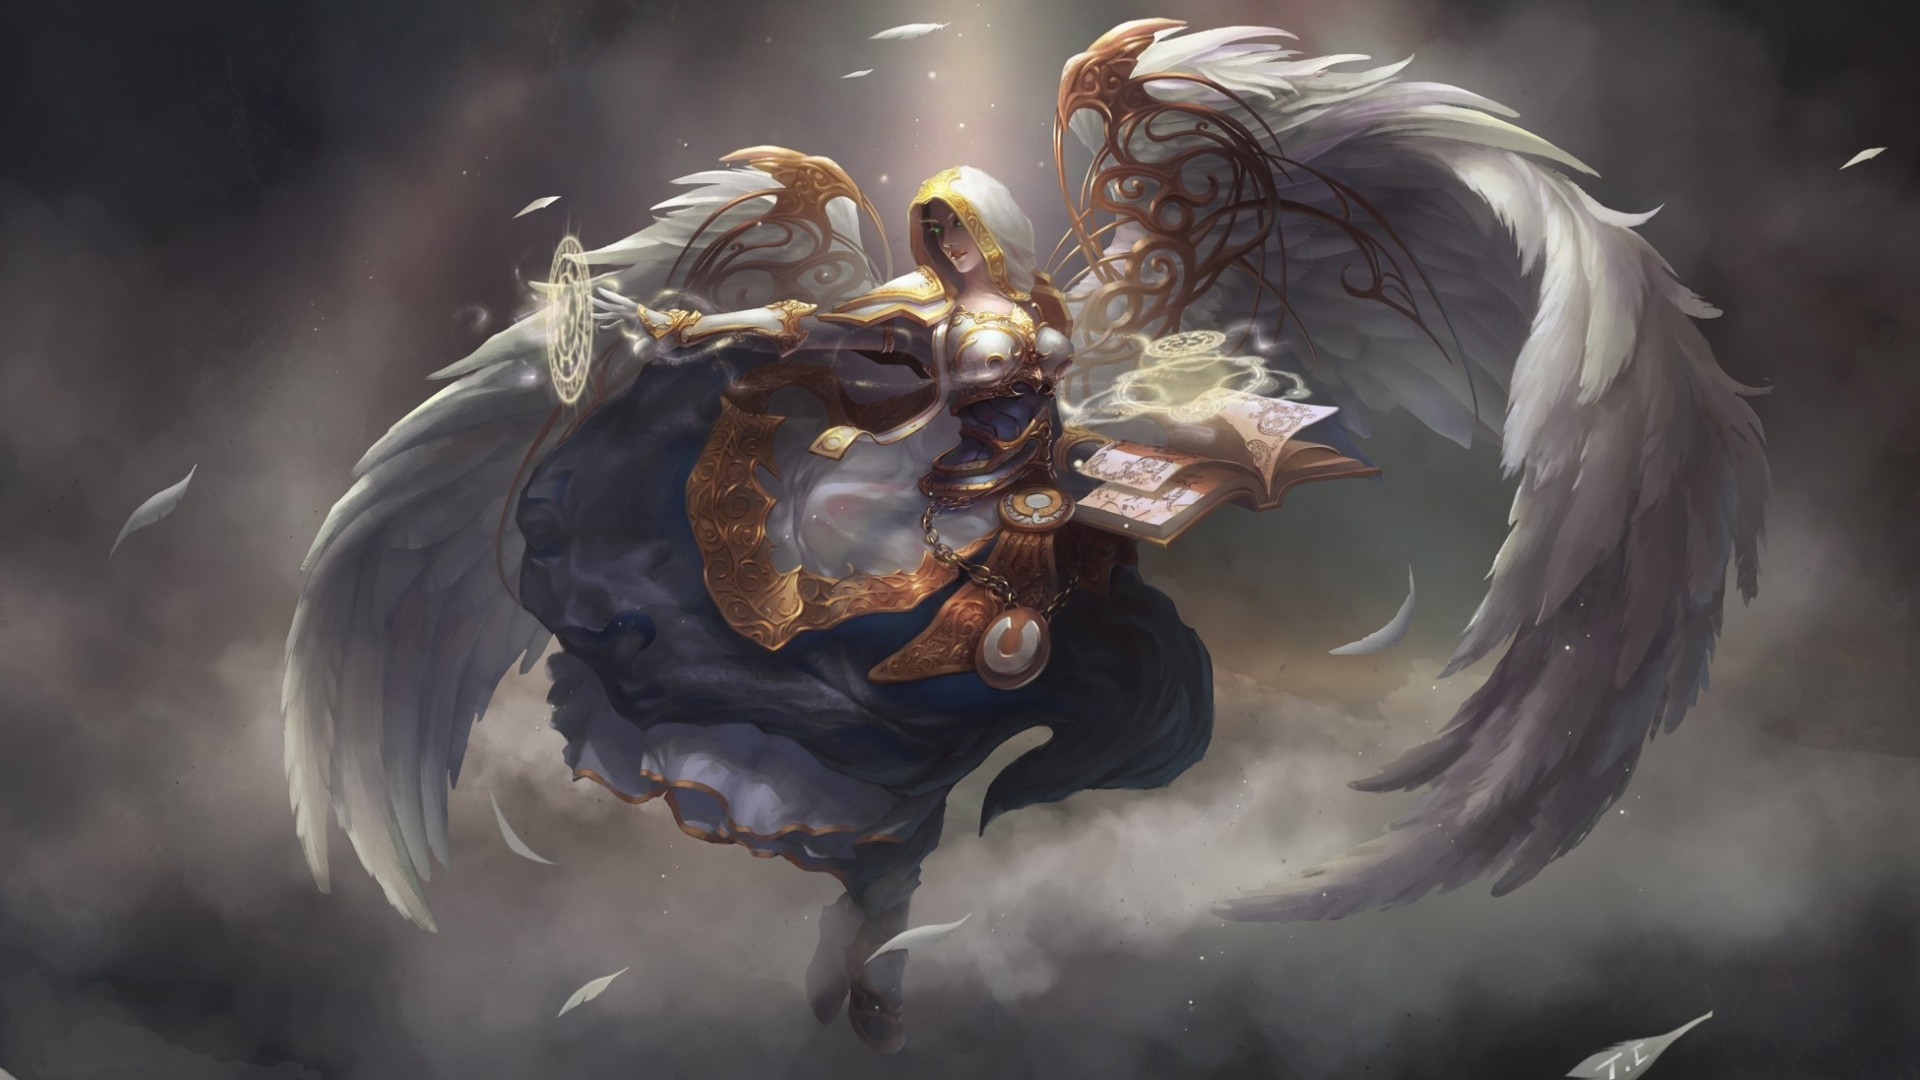 Warrior Fantasy Art Armor Angel Magic Wallpapers Hd: Kalera HD Wallpaper